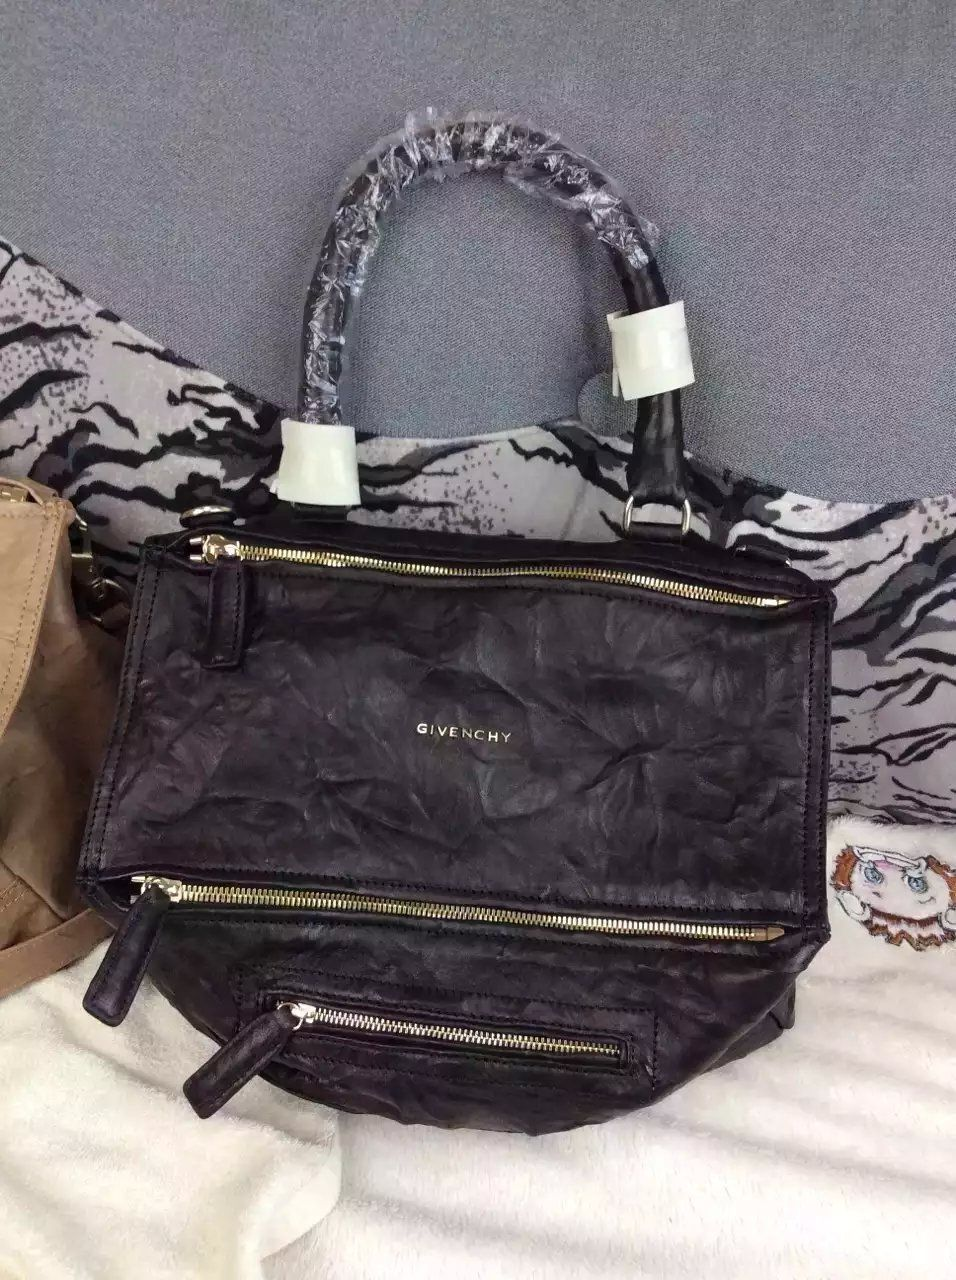 15c2fddca94 S S 2016 Givenchy Collection Outlet-Givenchy  PANDORA  Large Black Pepe  Sheepskin Leather Bag Sale Online